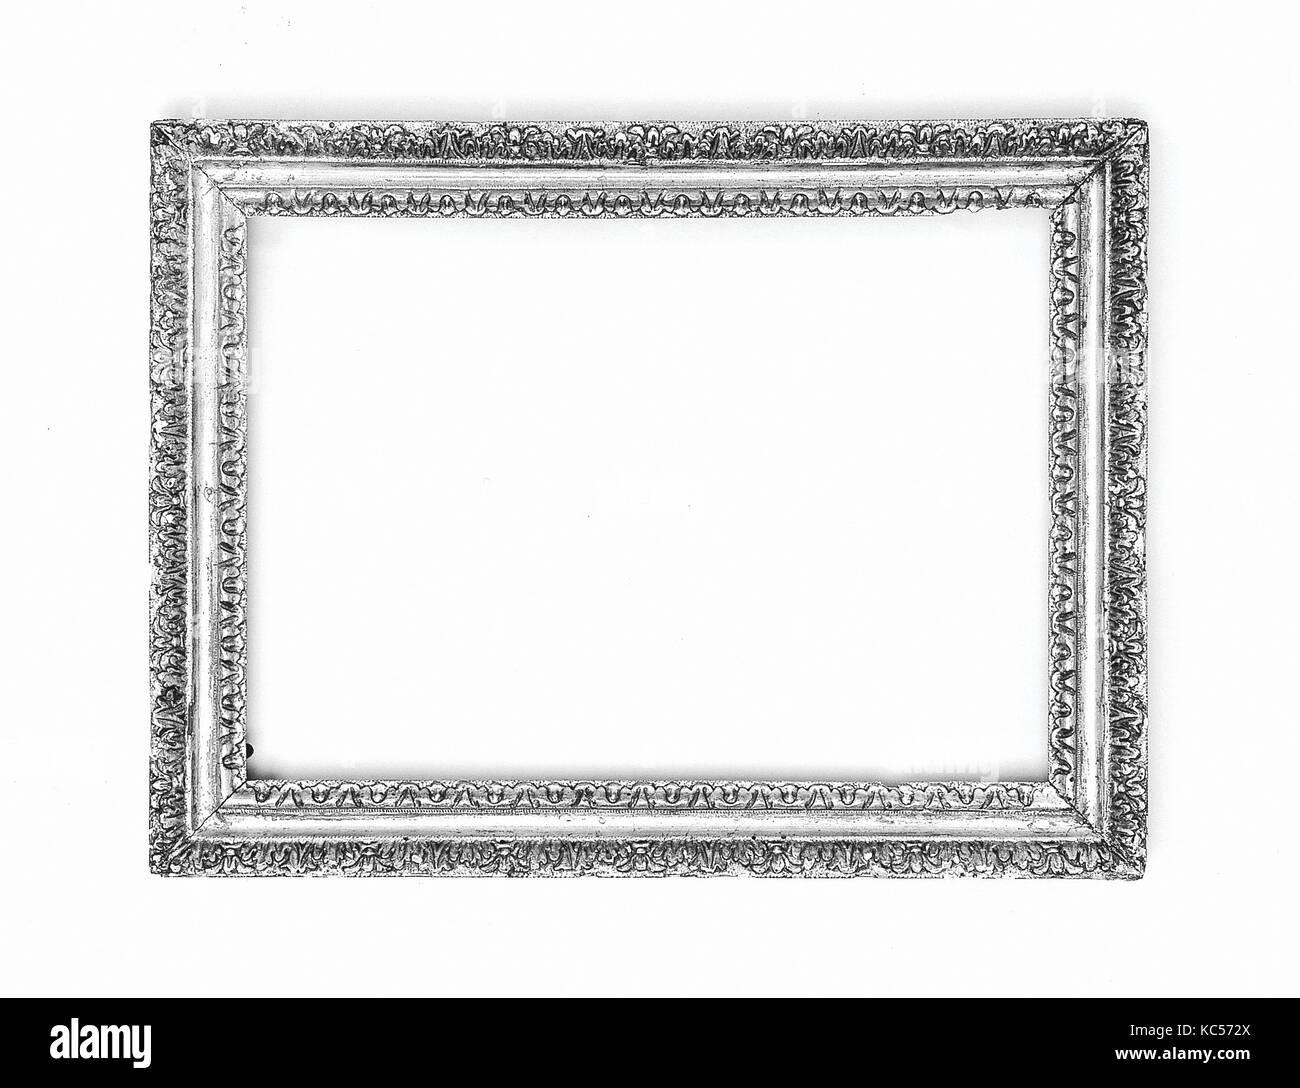 27 Cm X 30 Cm Stockfotos & 27 Cm X 30 Cm Bilder - Alamy